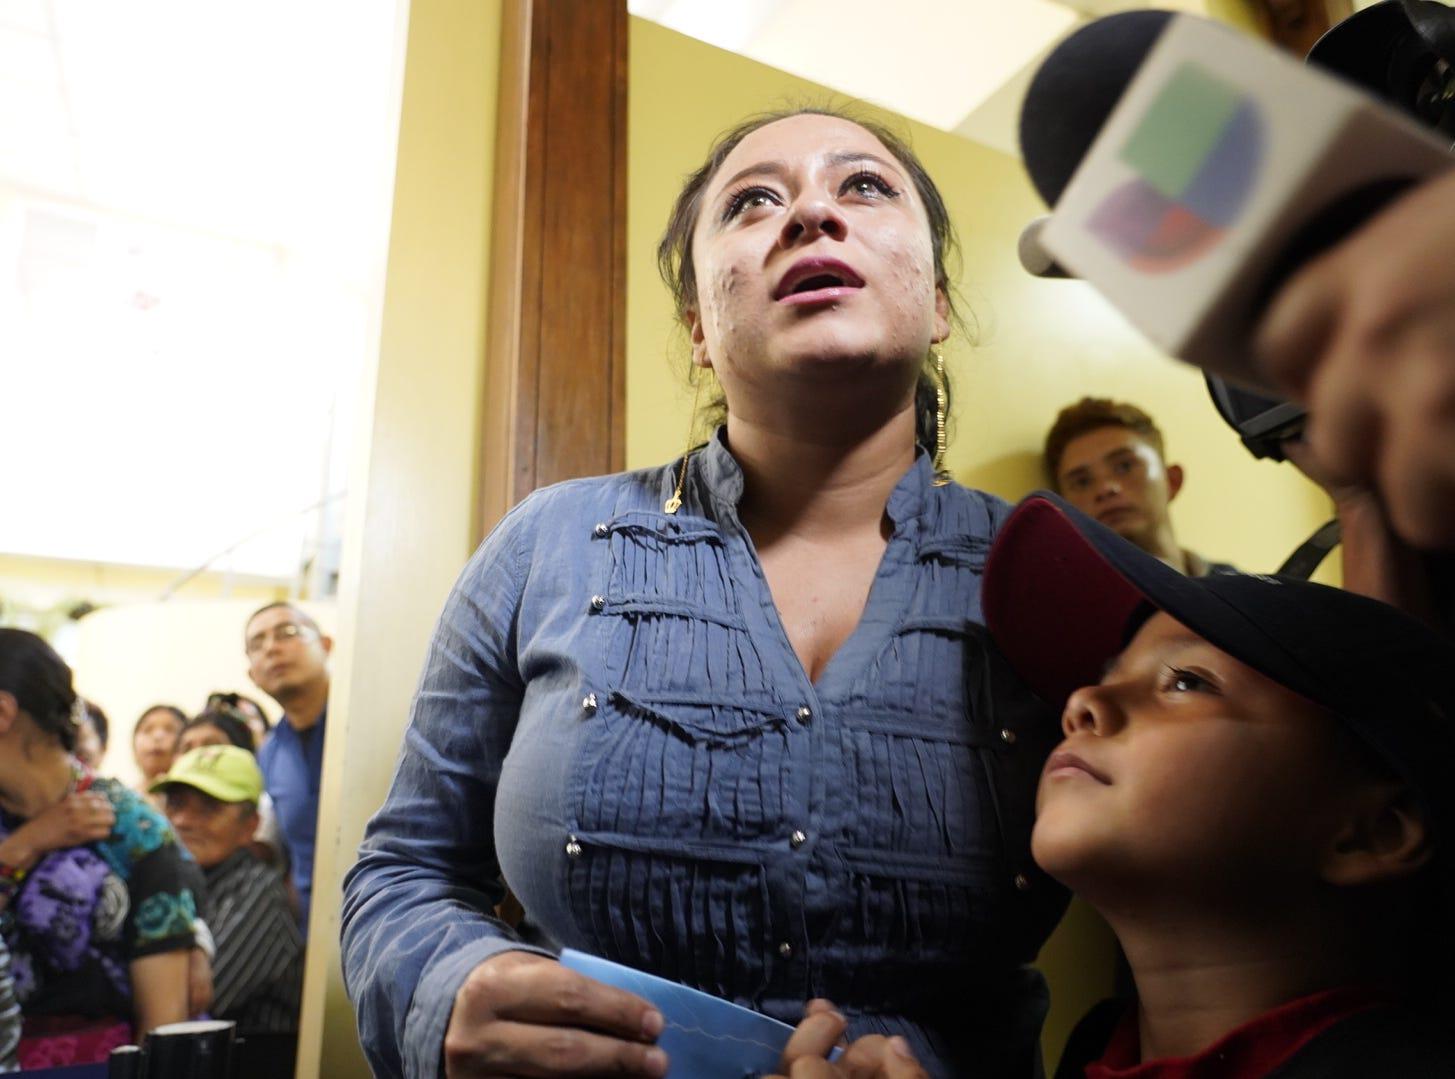 Leo Jeancarlo DeLeon is reunited with his mother, Lourdes Marianela DeLeon, in Guatemala on Aug. 7, 2018.